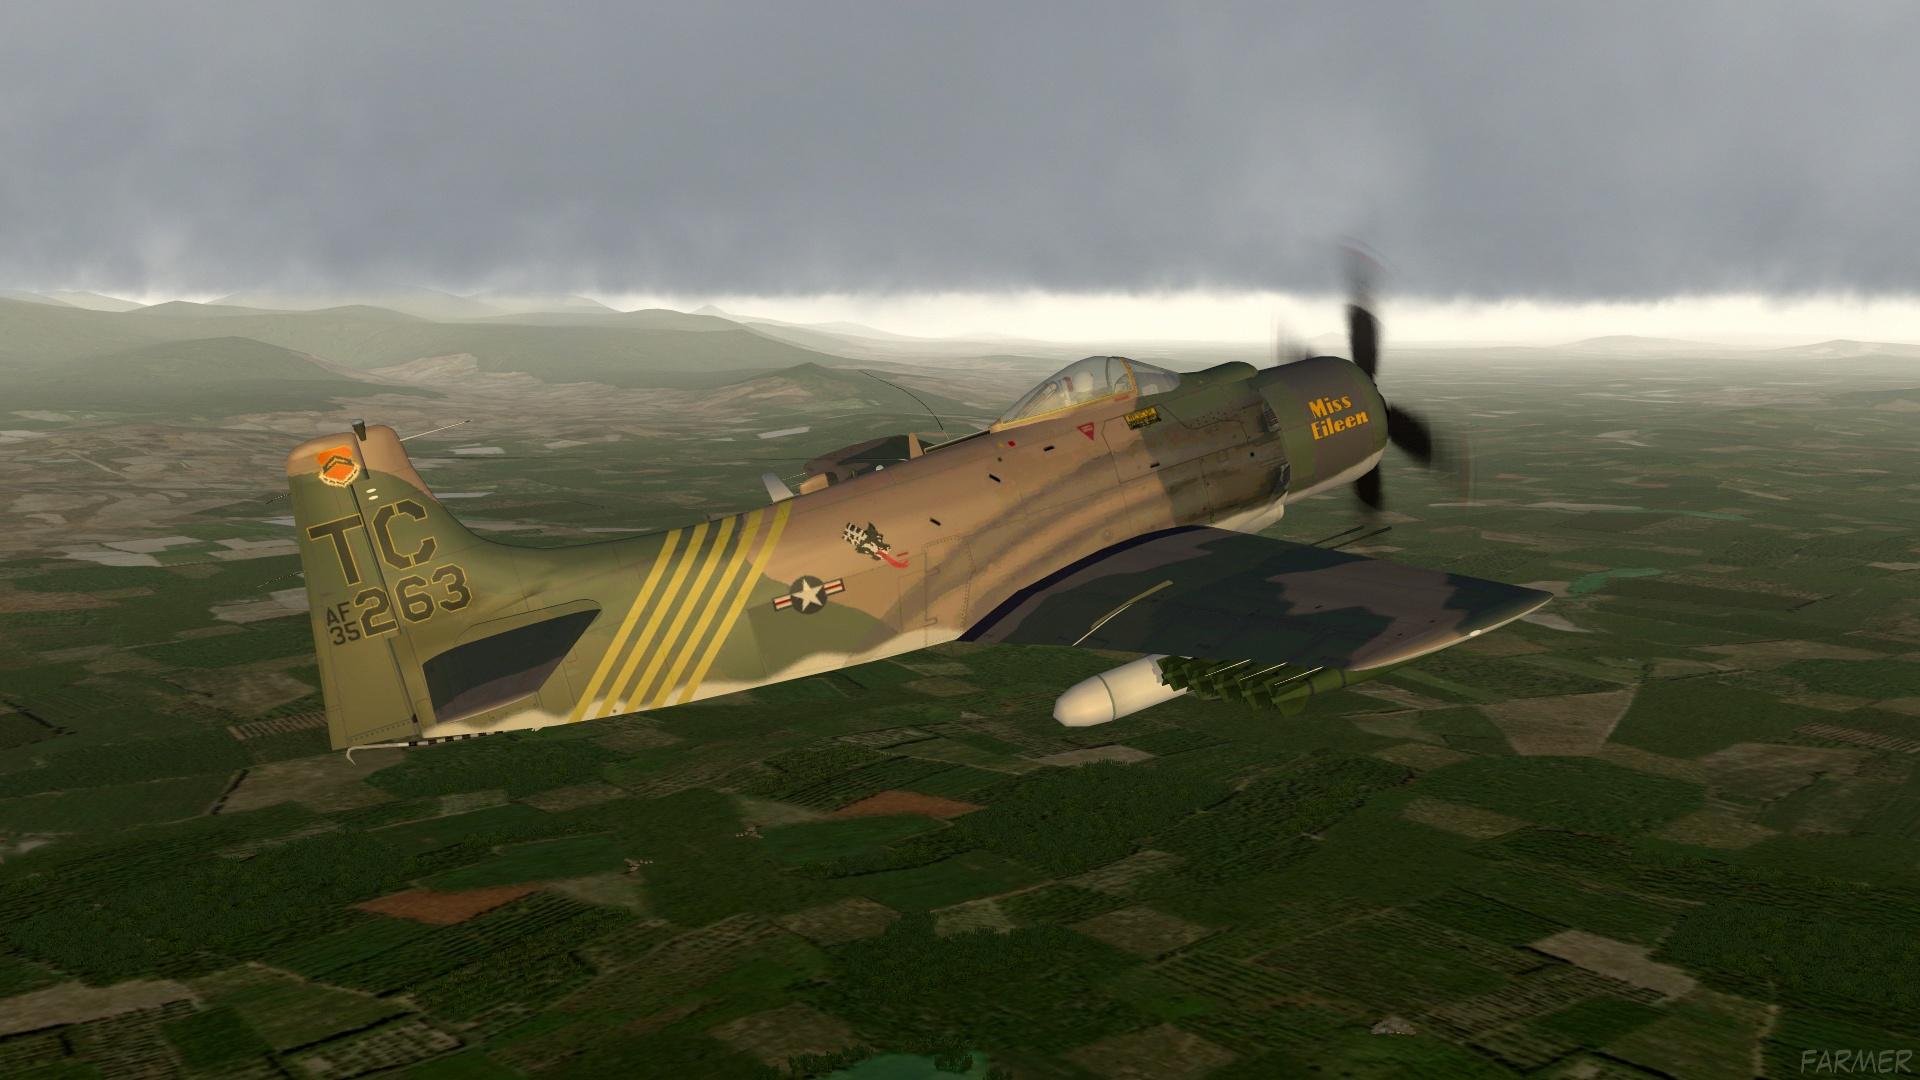 A 1J Skyraider 01